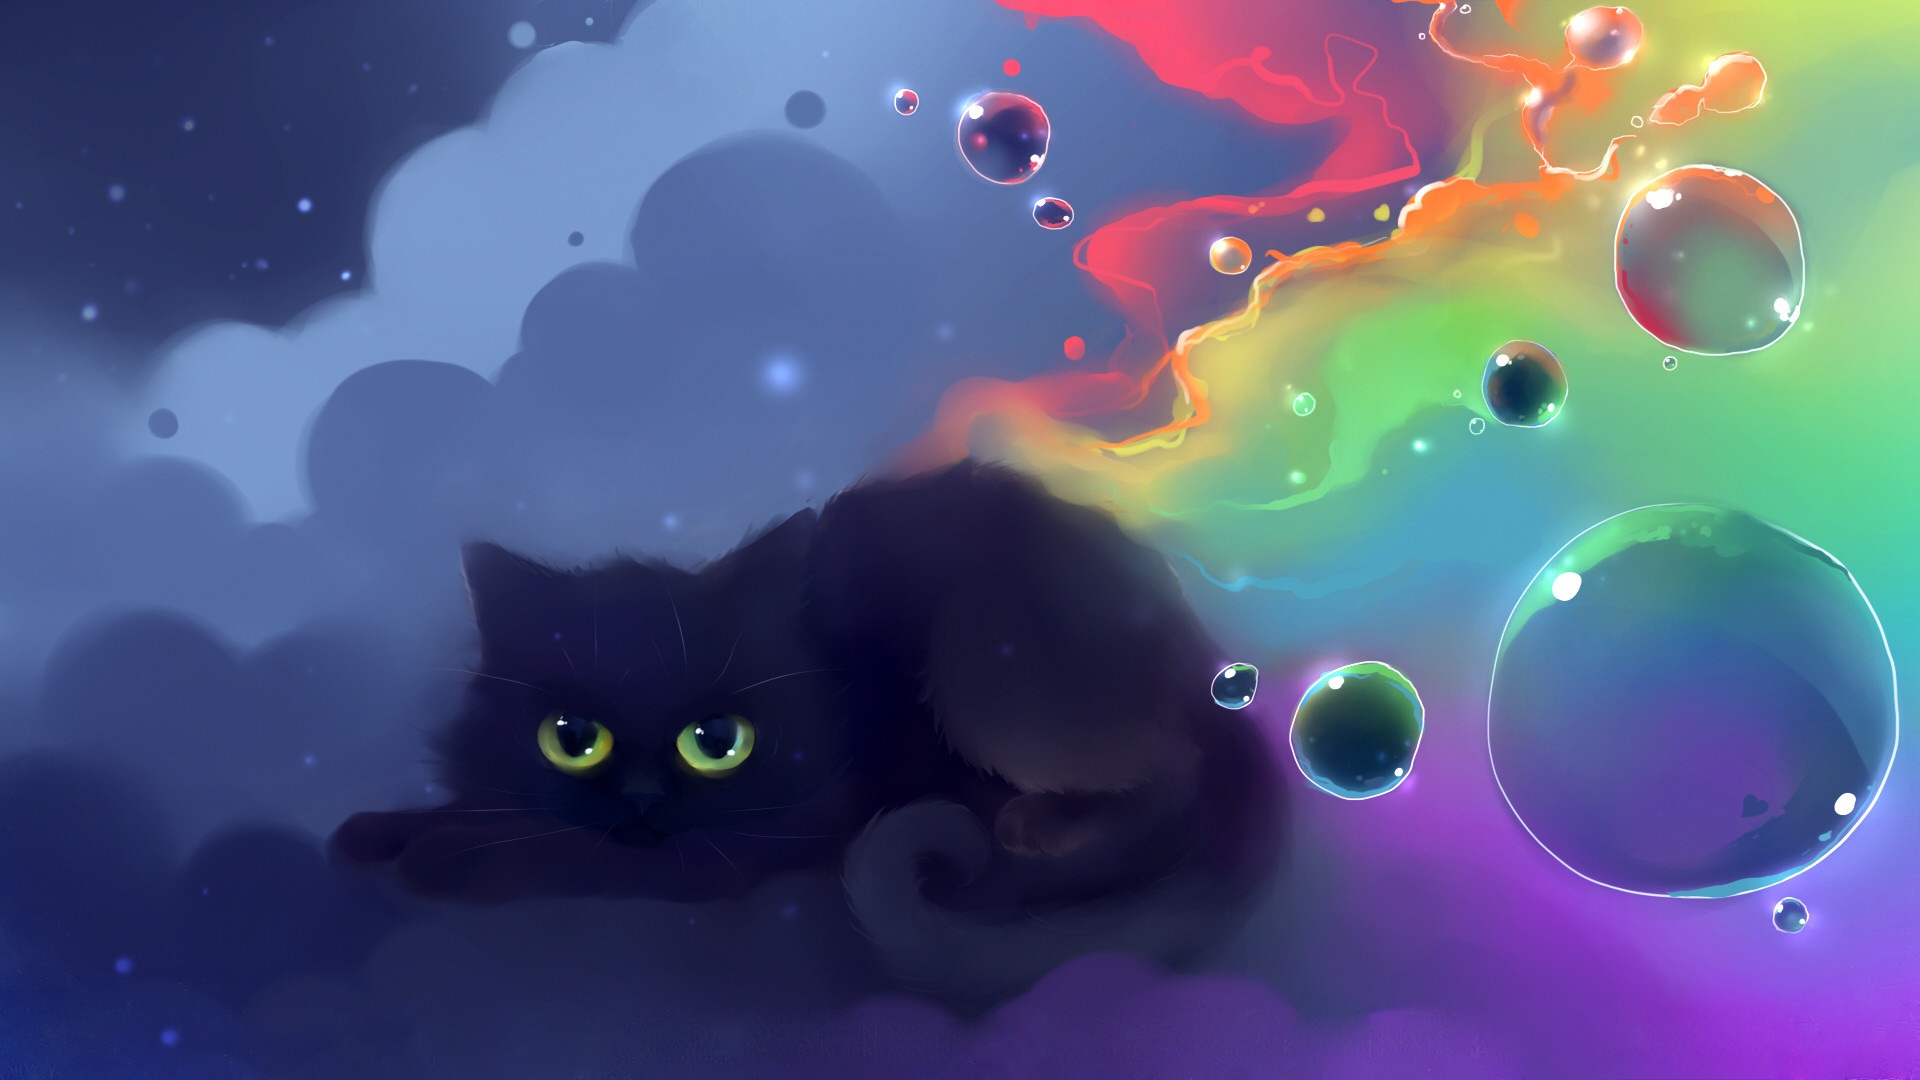 Kawaii Cat Wallpaper 67 Images